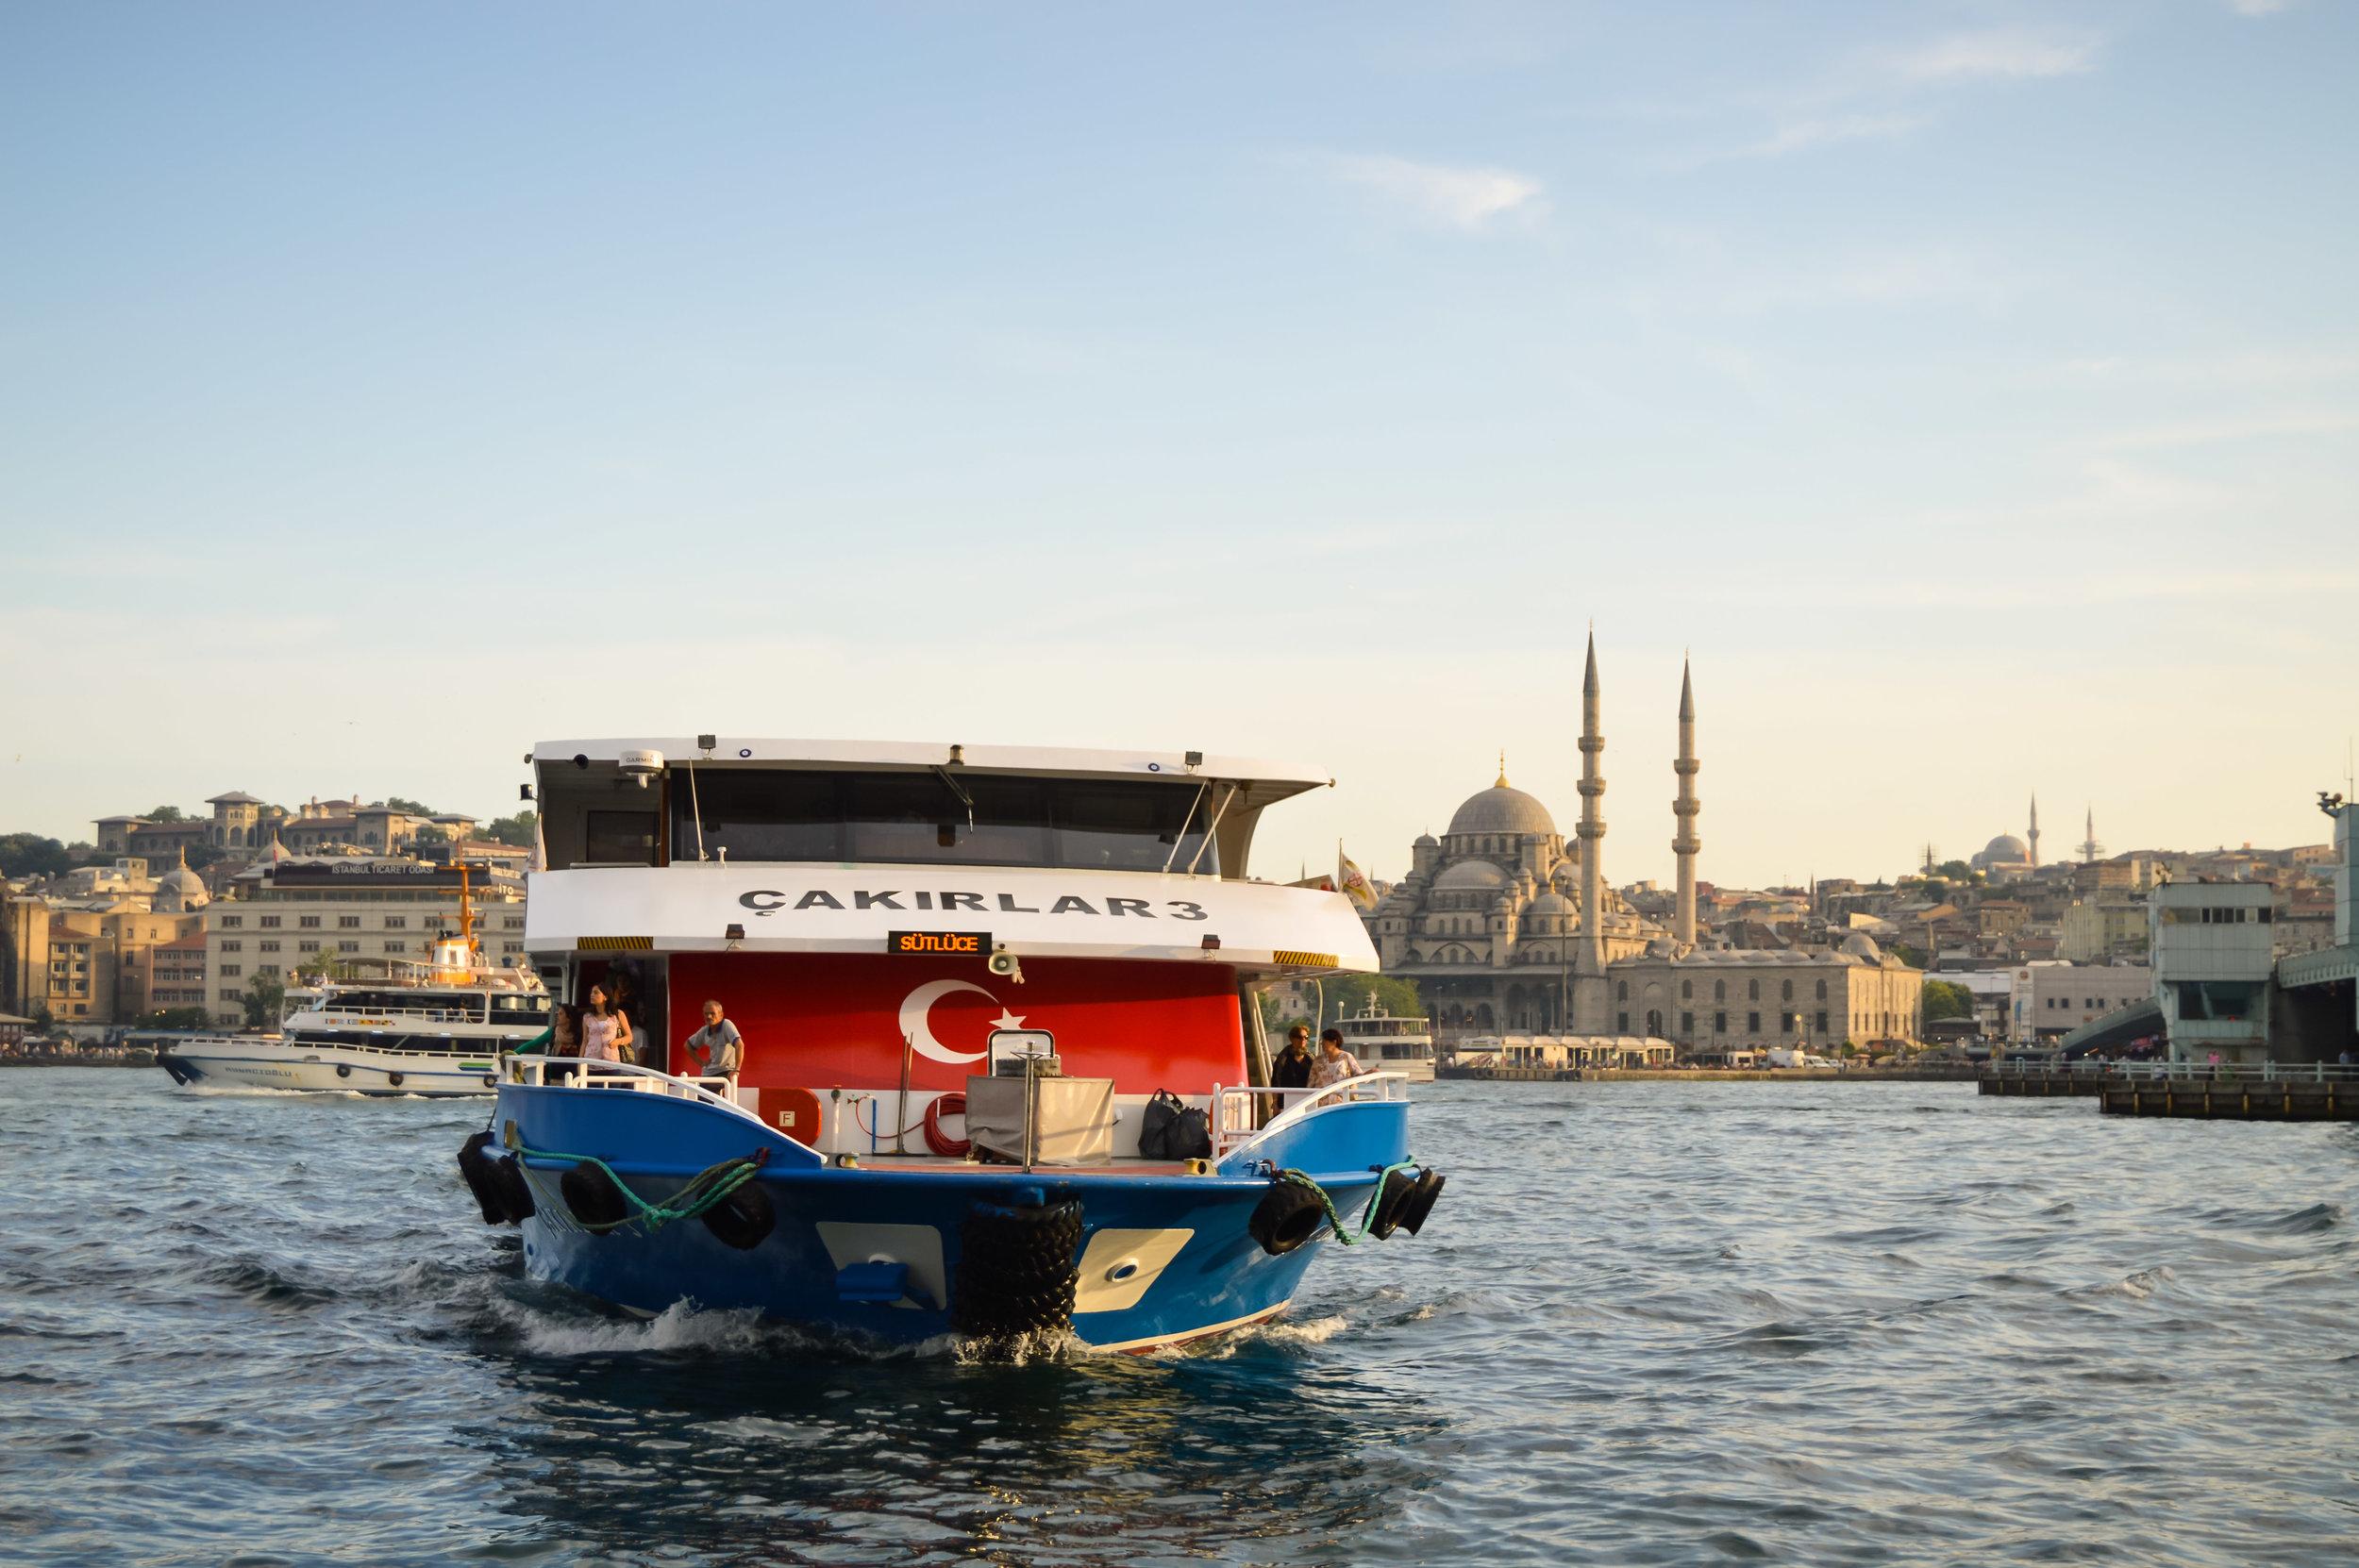 View from Karaköy Ferry Station Rowhomes Mosques Skyline Bosporus Bosphorus Blue Sky Muslim Ottoman Empire Architecture Istanbul Turkey Blue Mosque Hagia Sophia